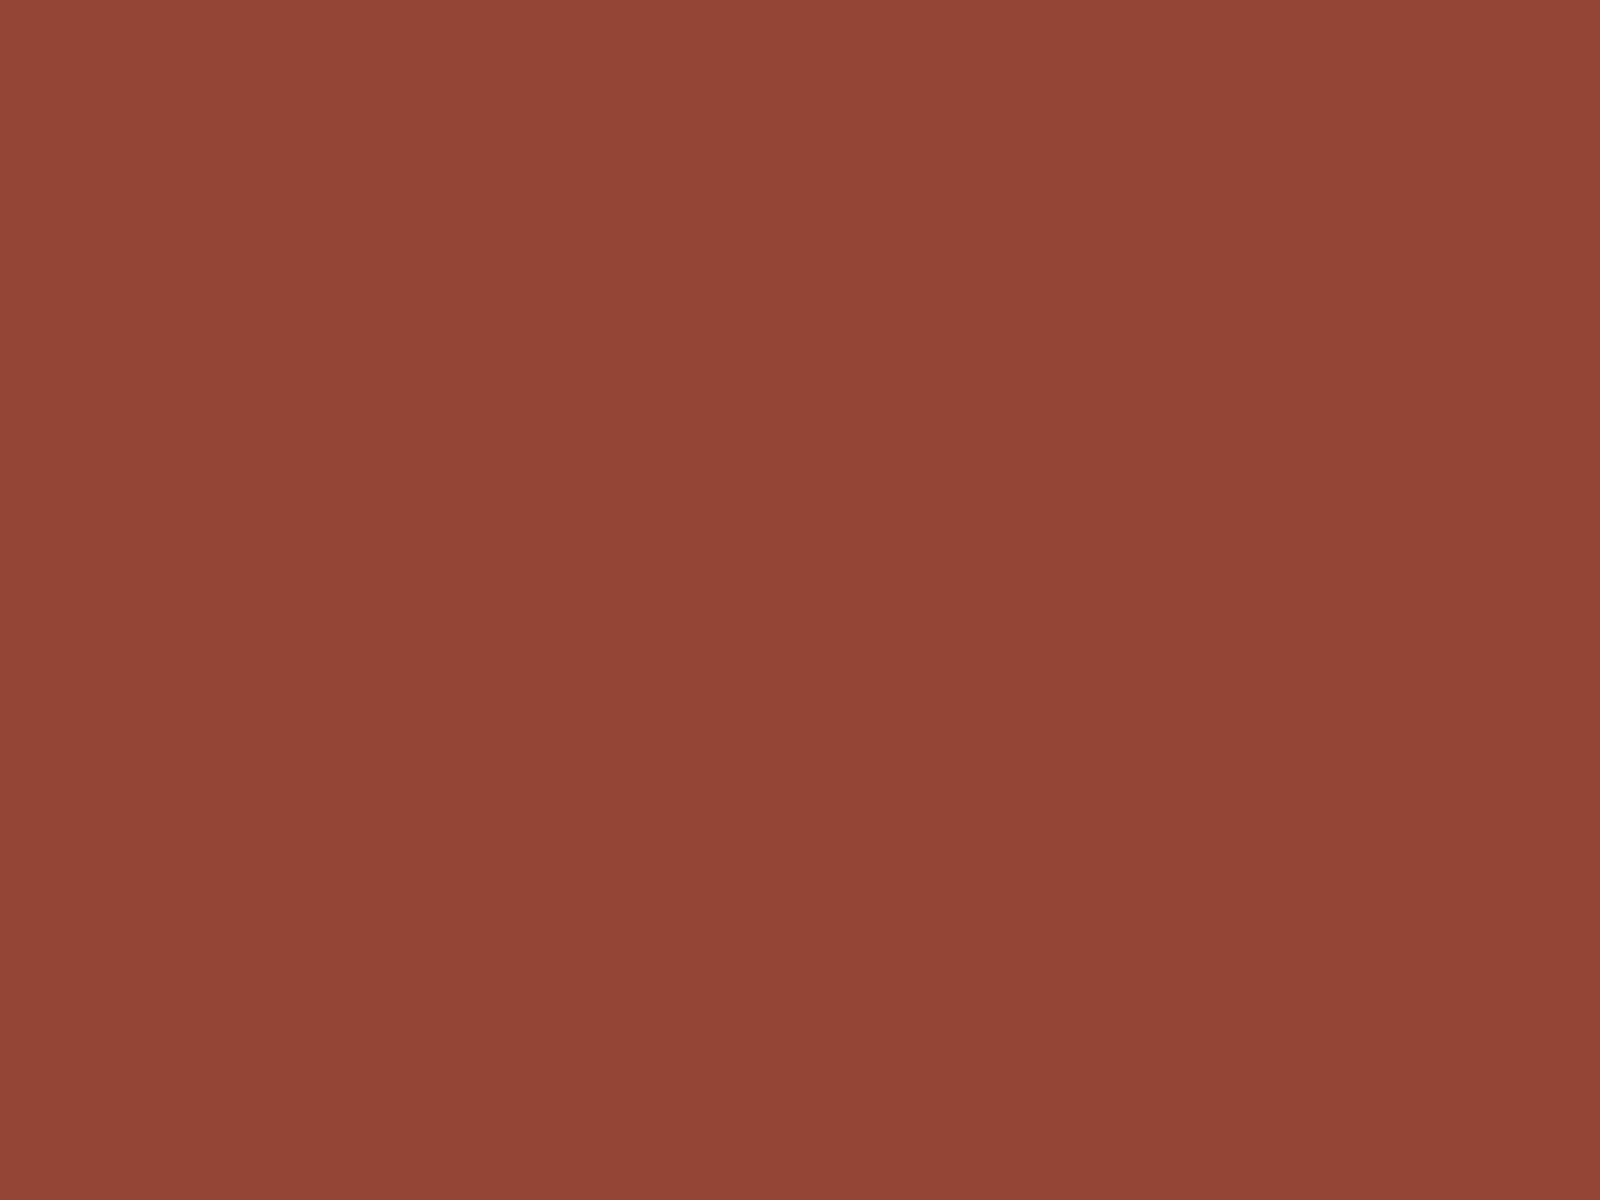 1600x1200 Chestnut Solid Color Background